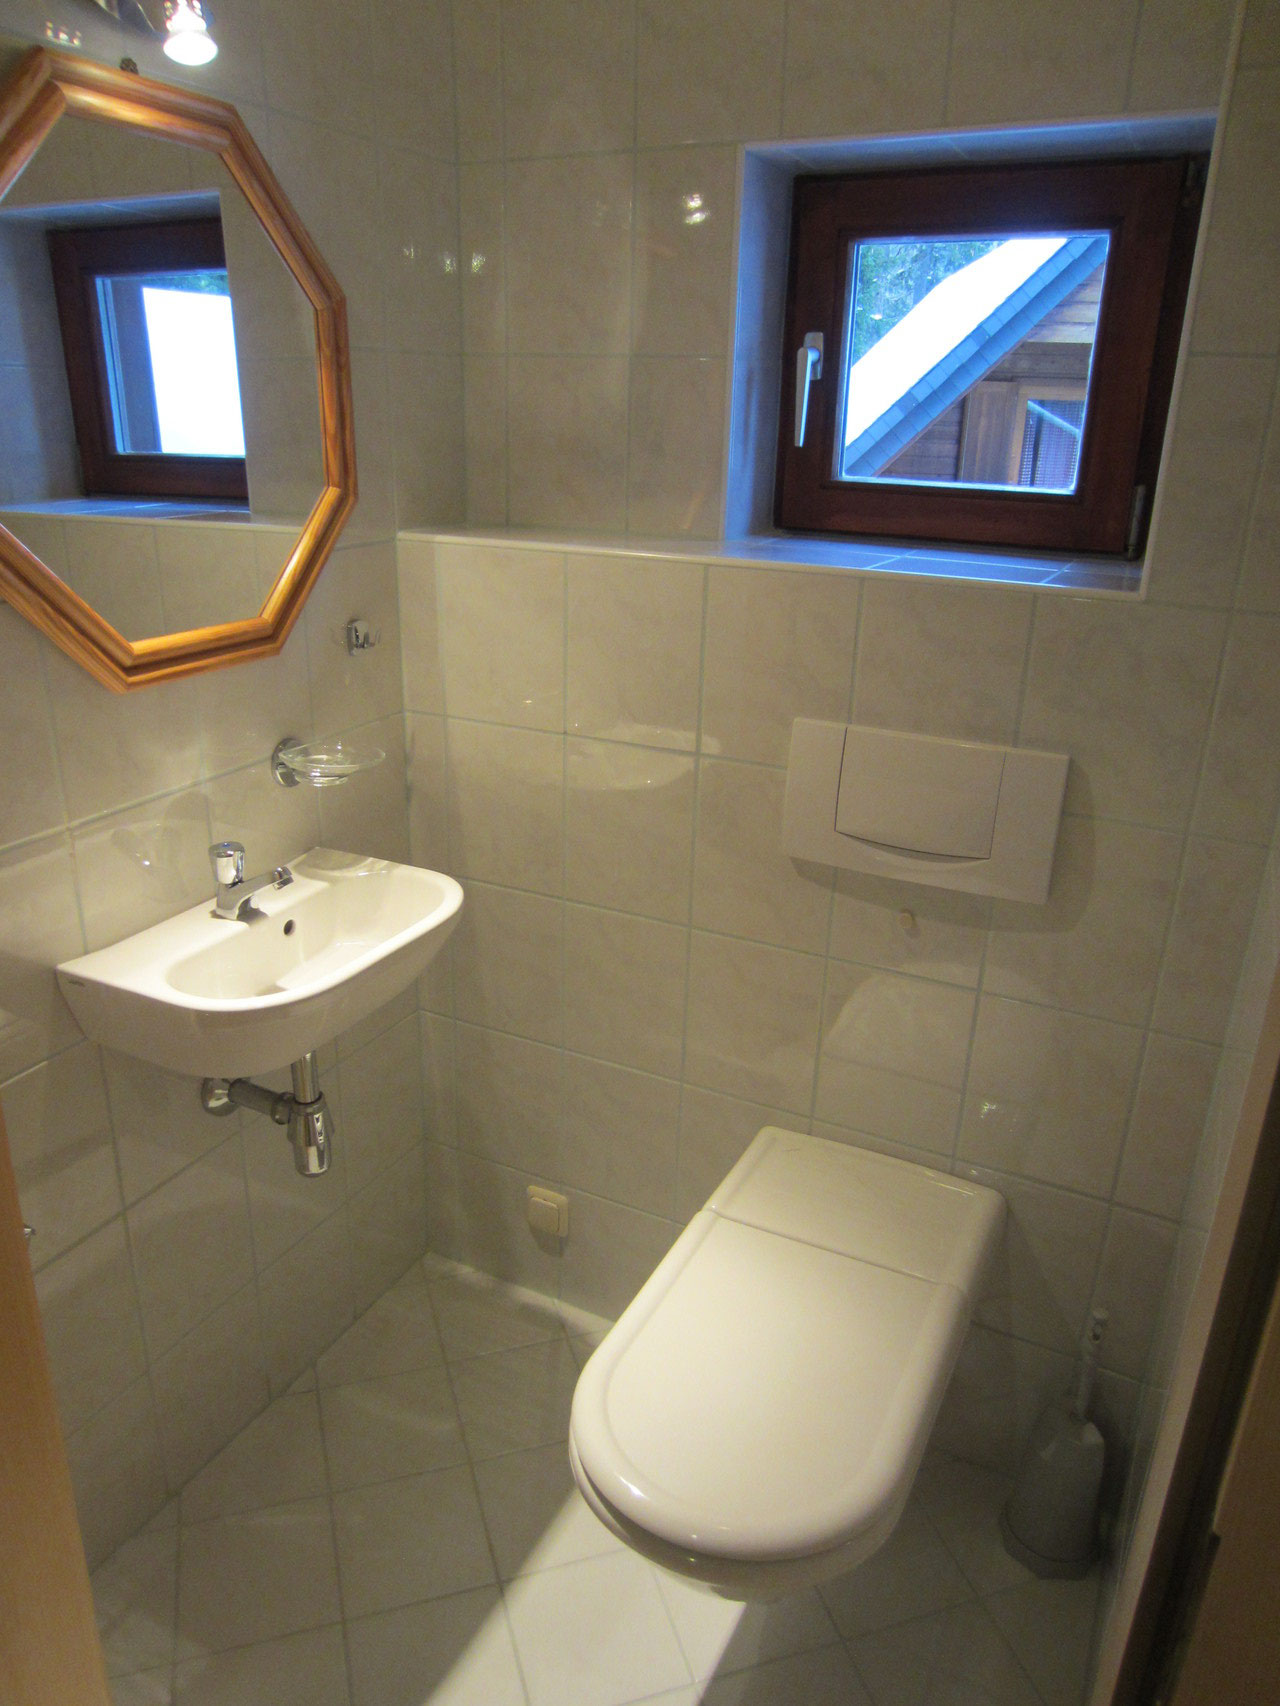 Zirbenwald Lodge - WC im Wohngeschoss